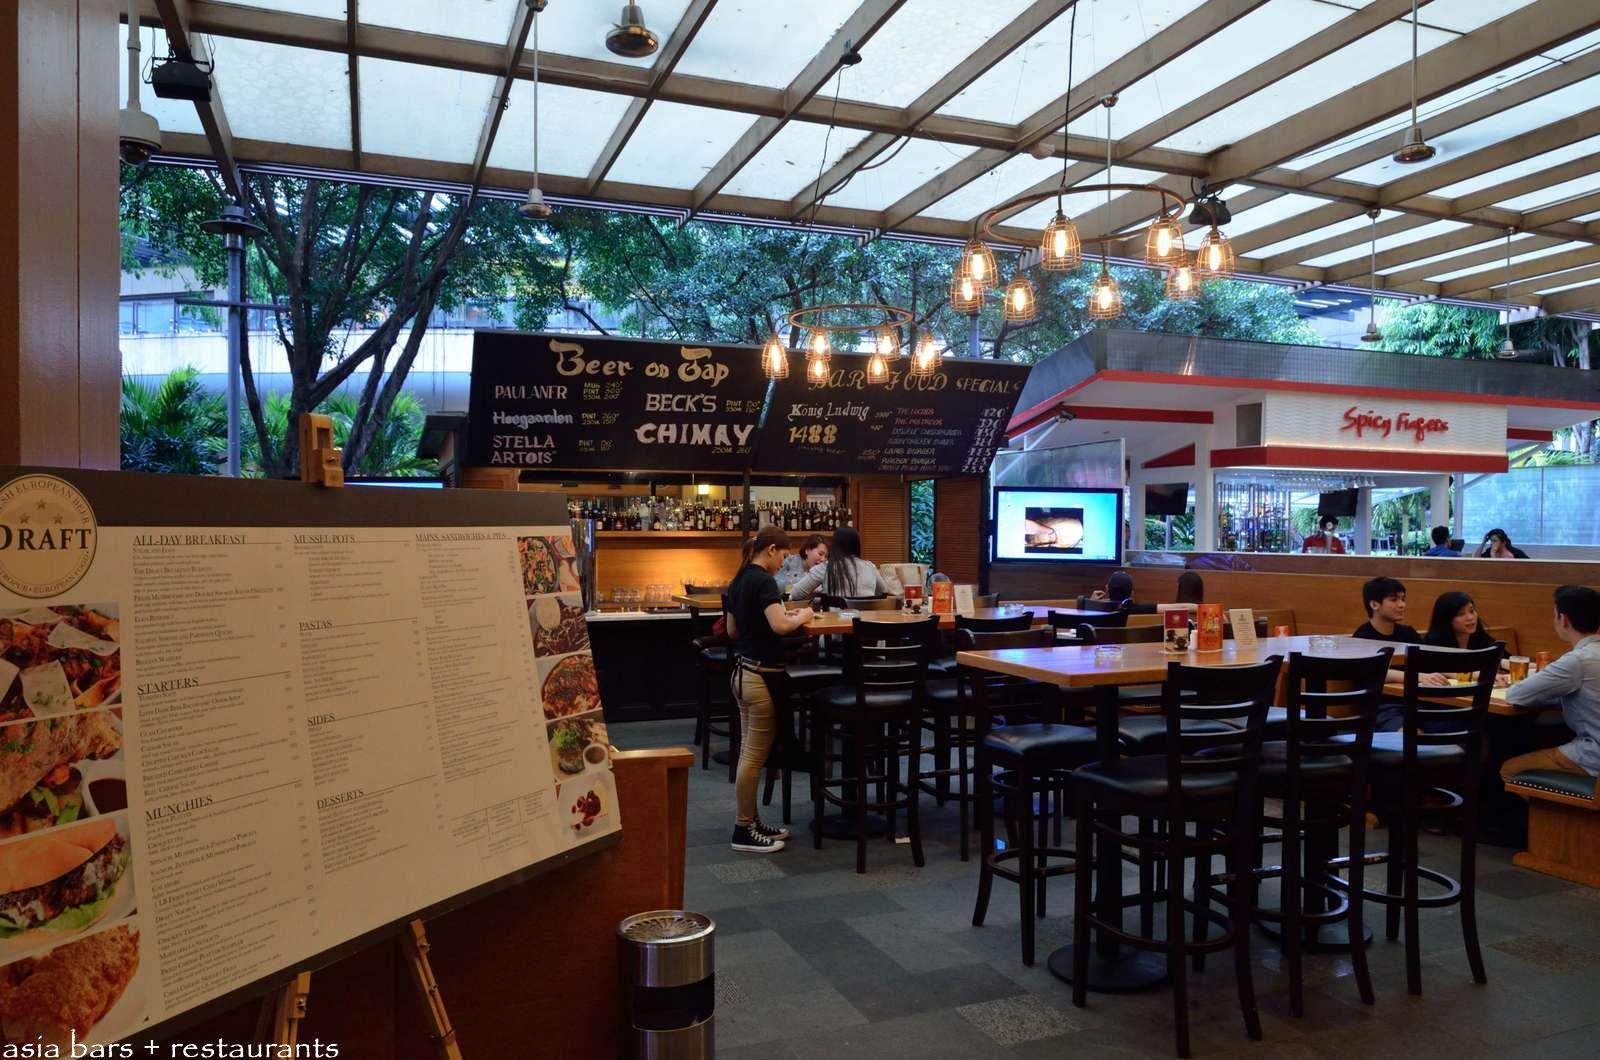 Draft Gastropub European Beer Bar Amp Restaurant